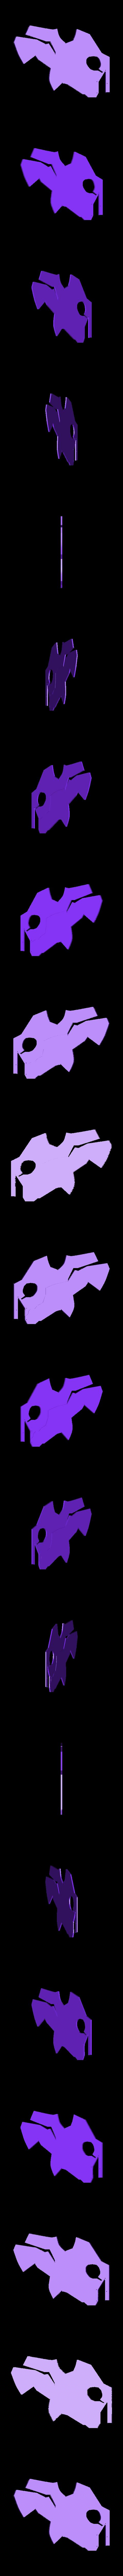 Blade_Left1.stl Download free STL file Guardian Shield+ Zelda Breath of the Wild • 3D print object, Adafruit